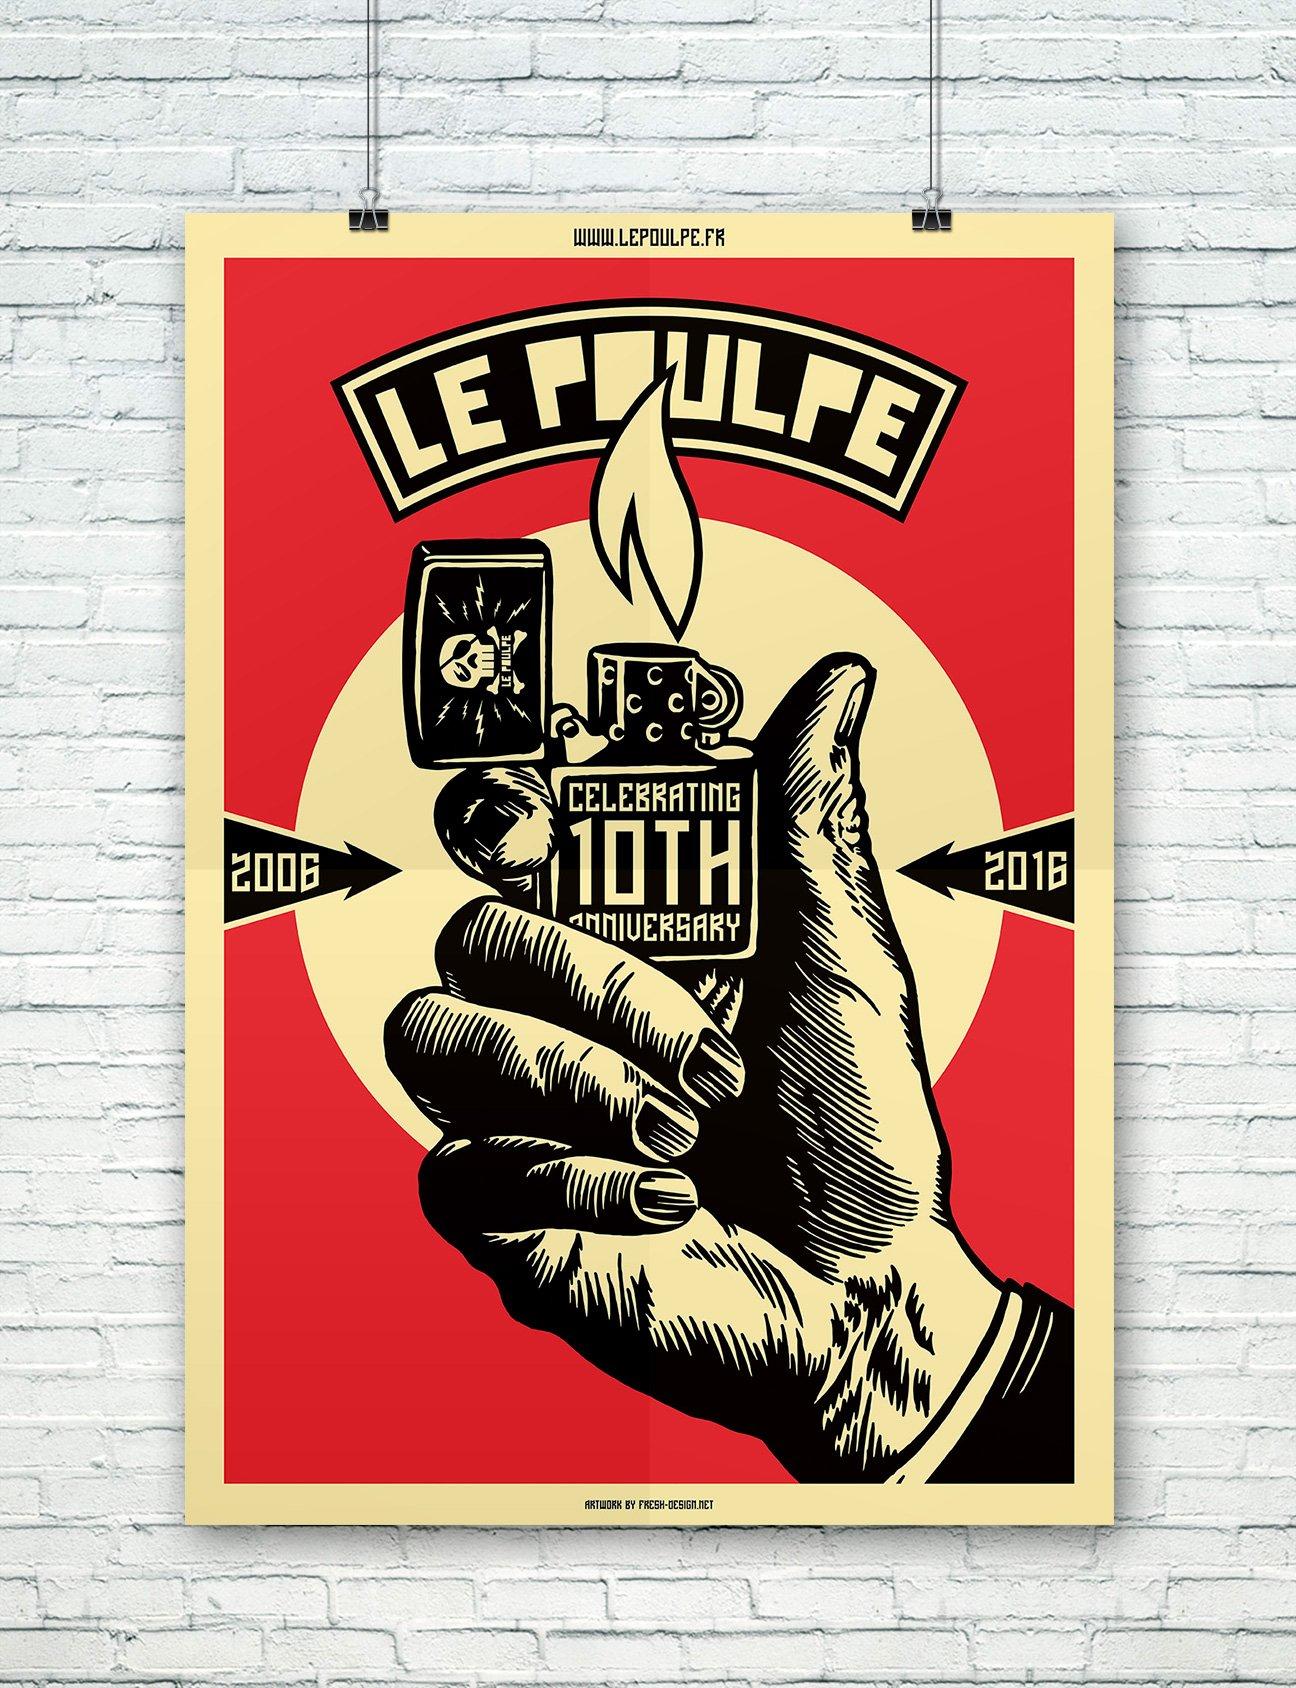 Fabien_cuffel_LePoulpe_Resto_Bar_Concert_Affiche_10ans